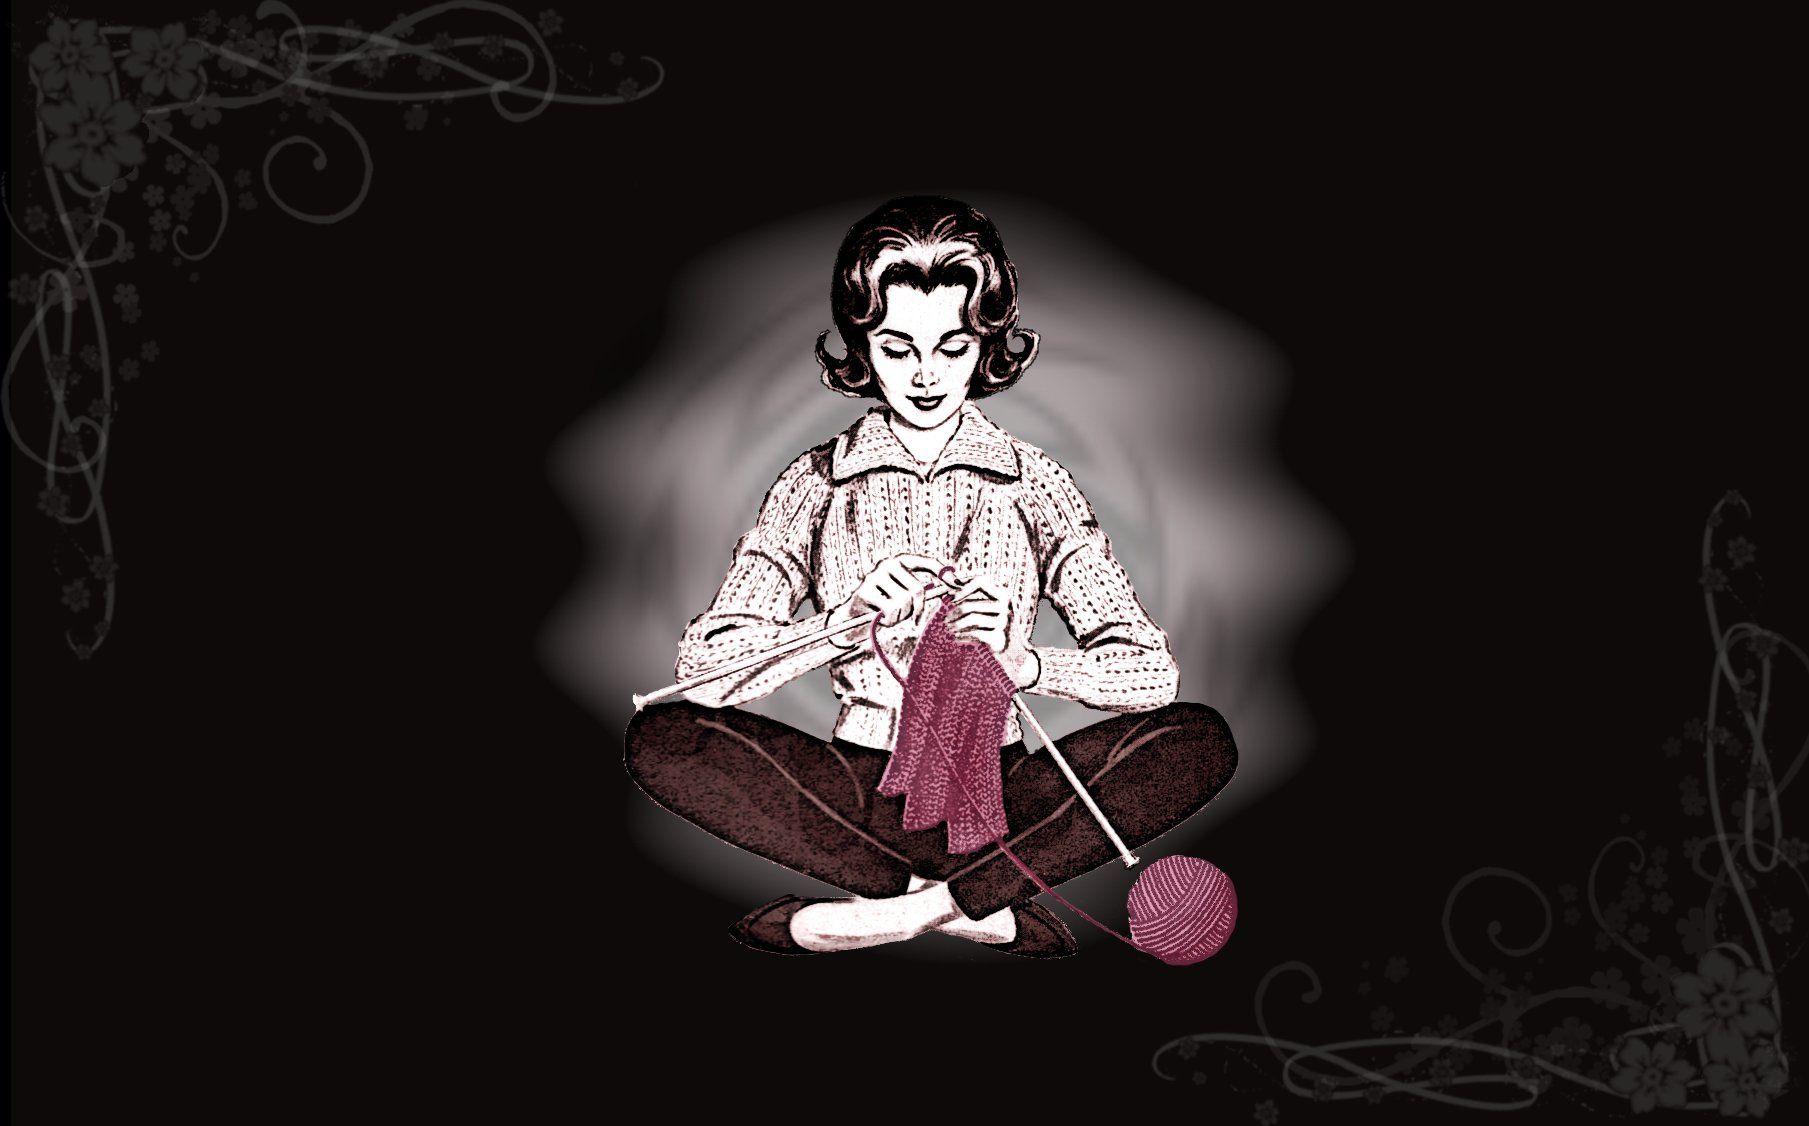 Meditating Knitter by minishadowlove